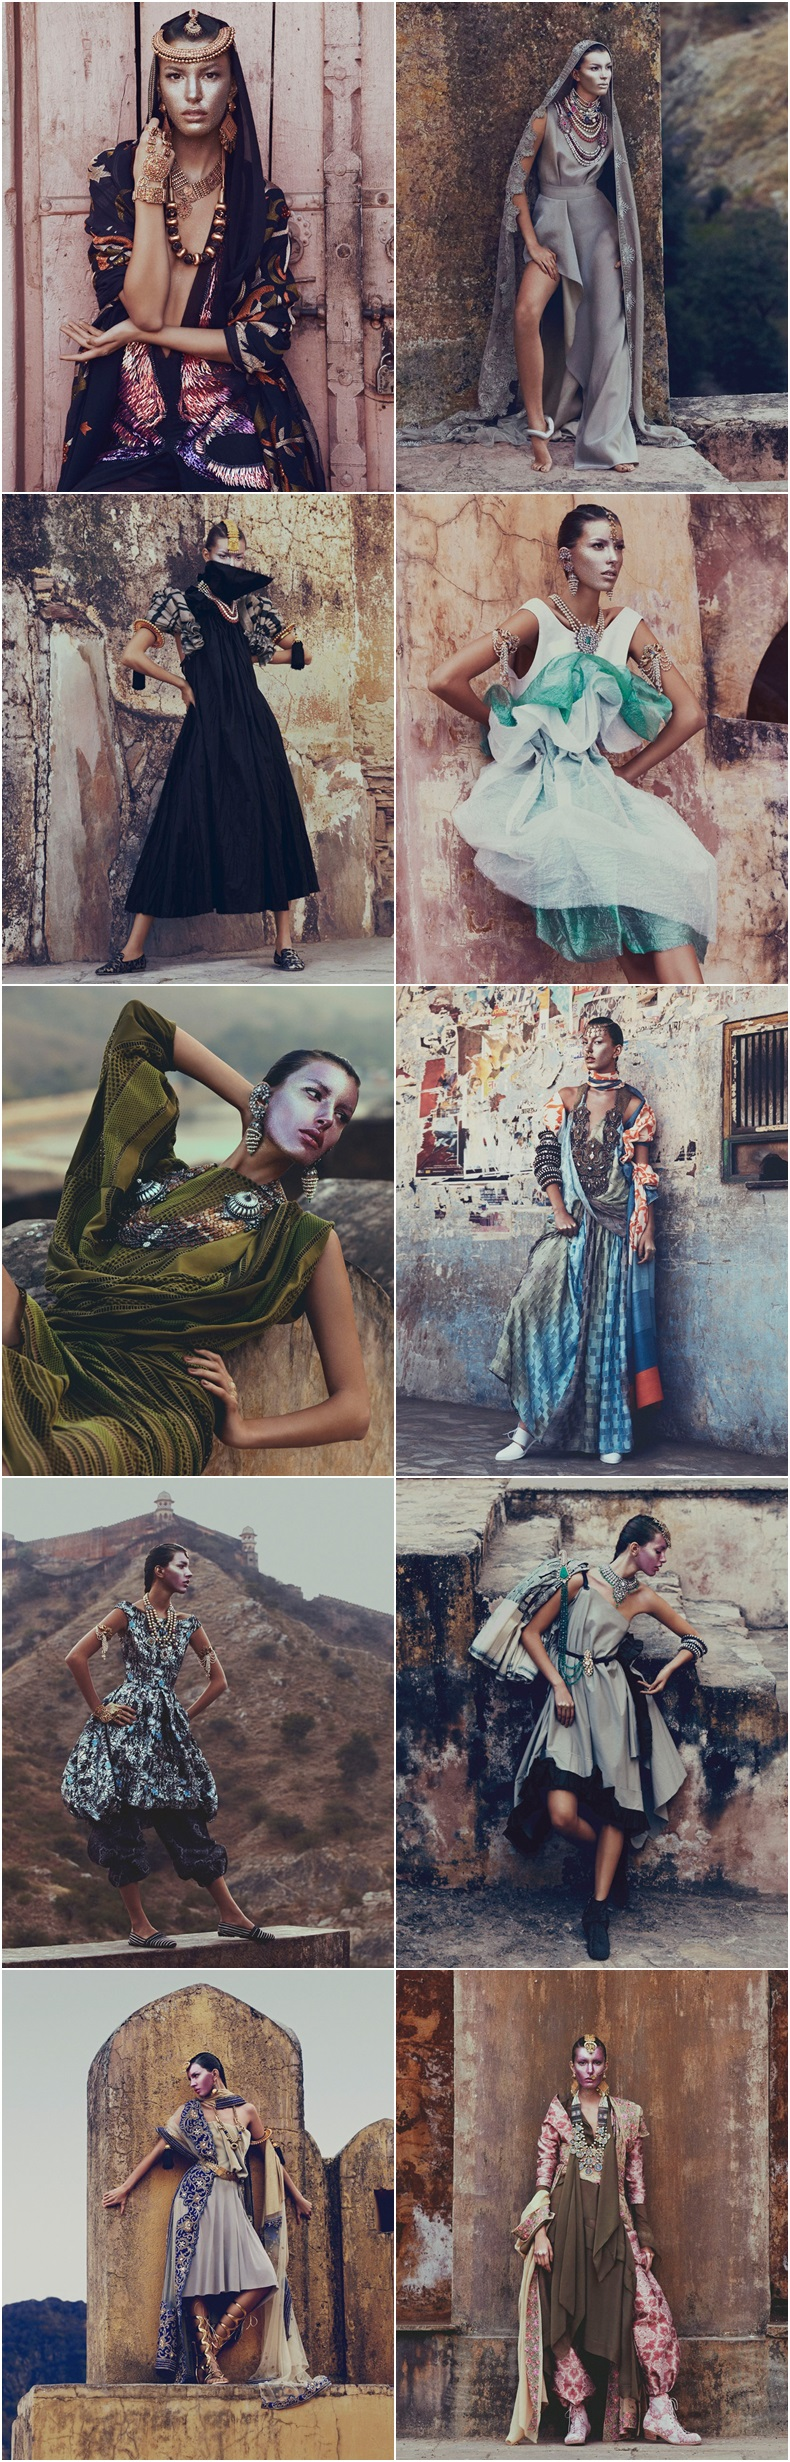 kate-king-fashion4addicts.com